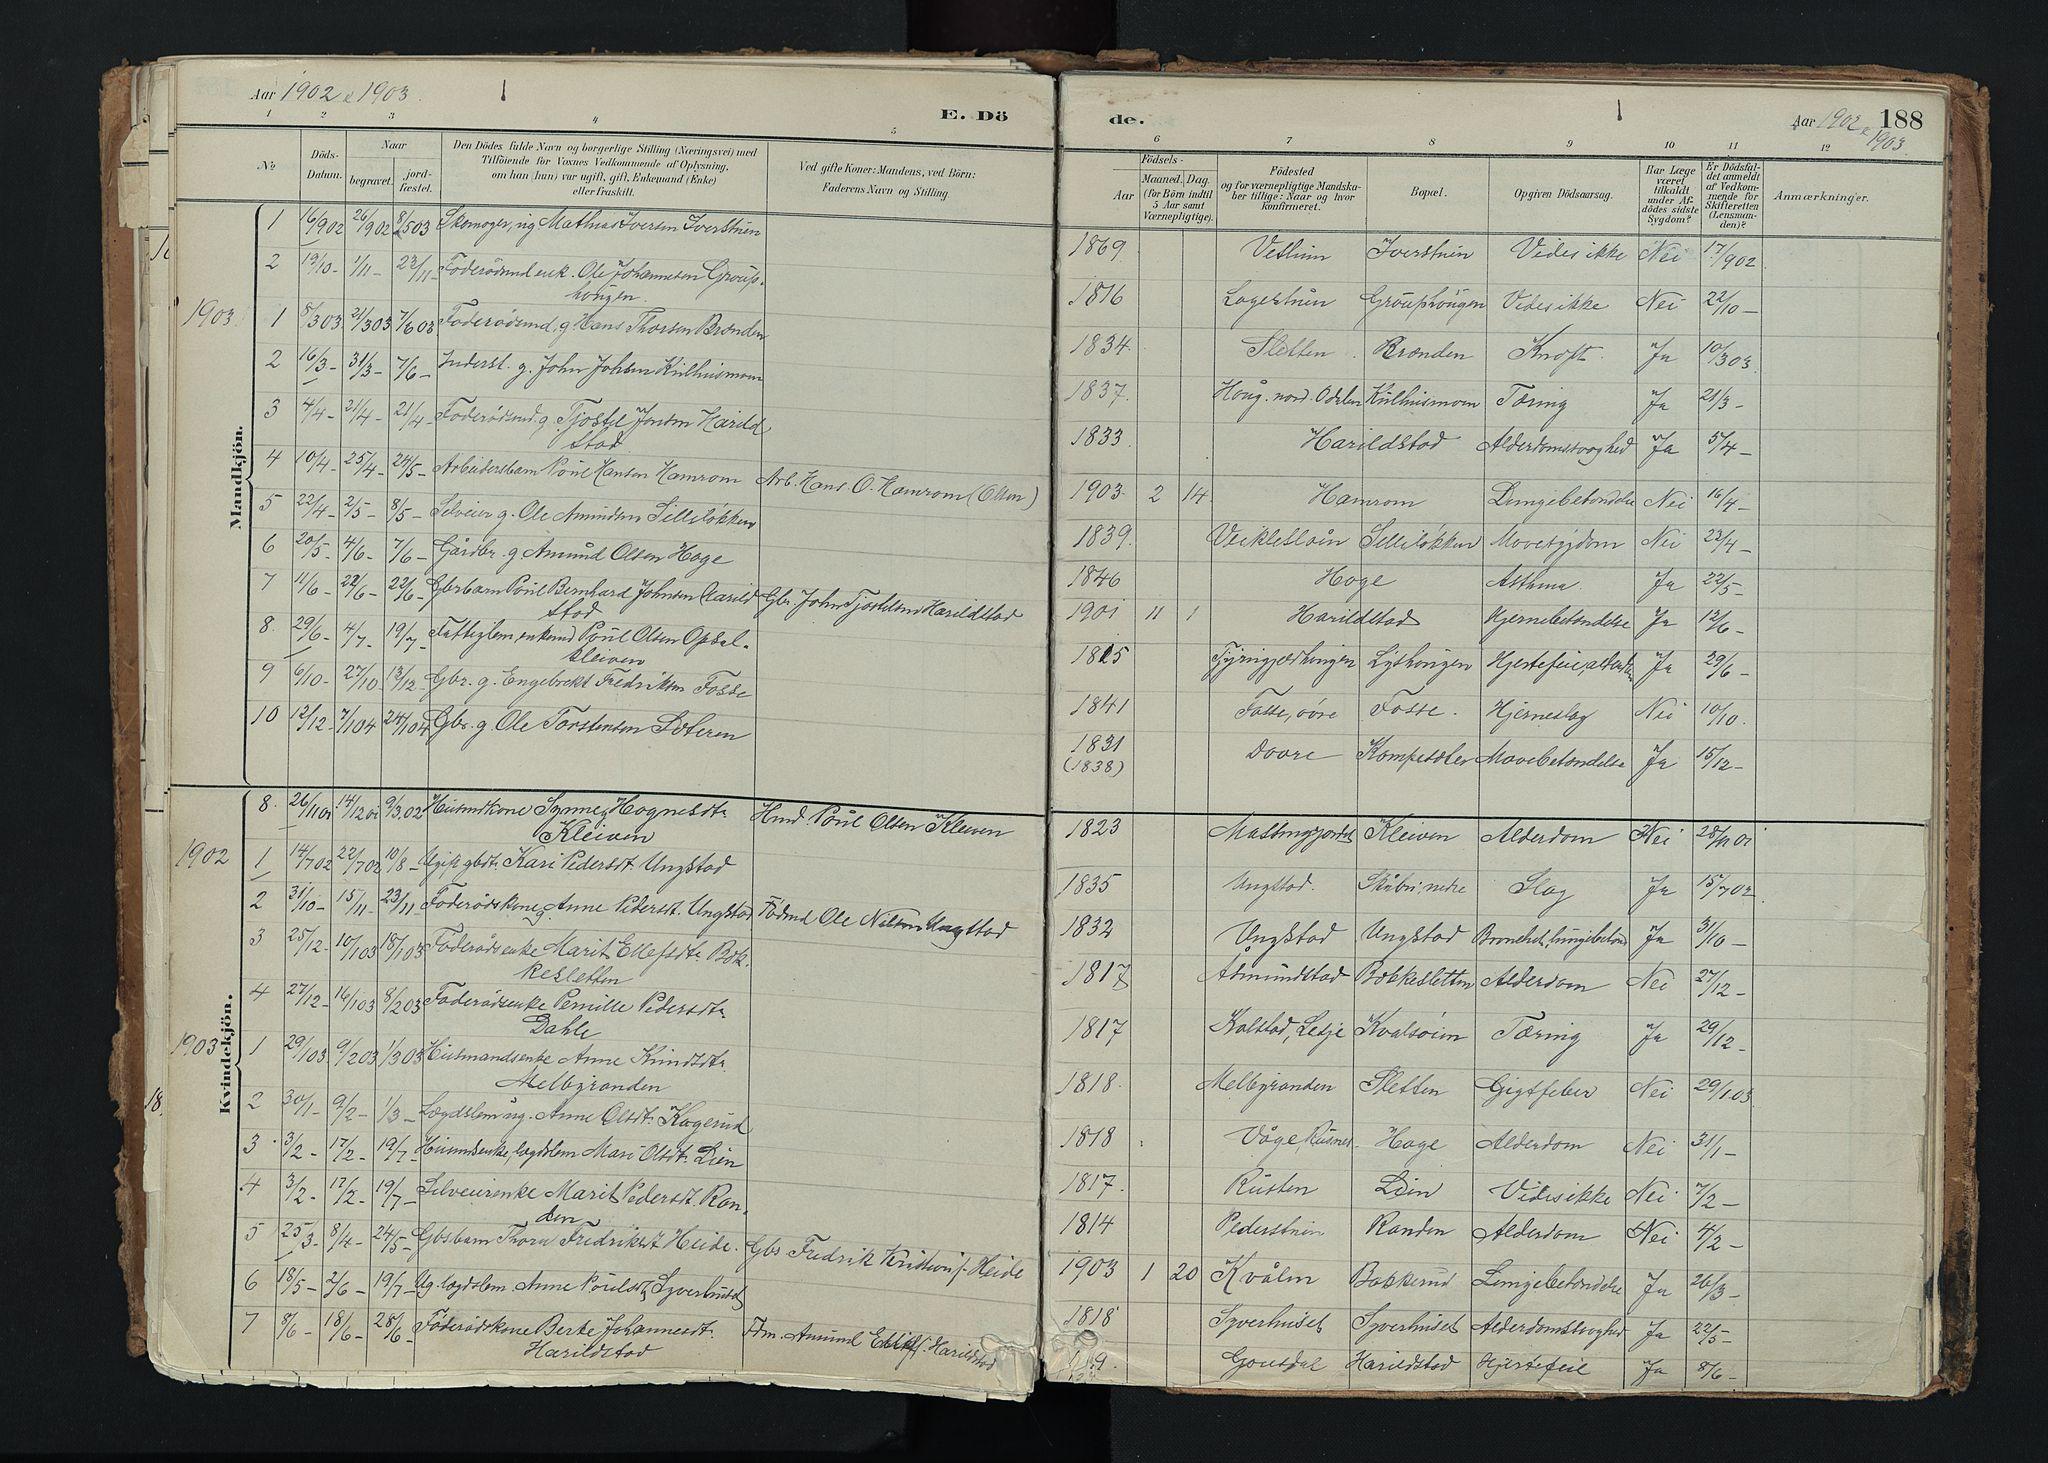 SAH, Nord-Fron prestekontor, Ministerialbok nr. 5, 1884-1914, s. 188